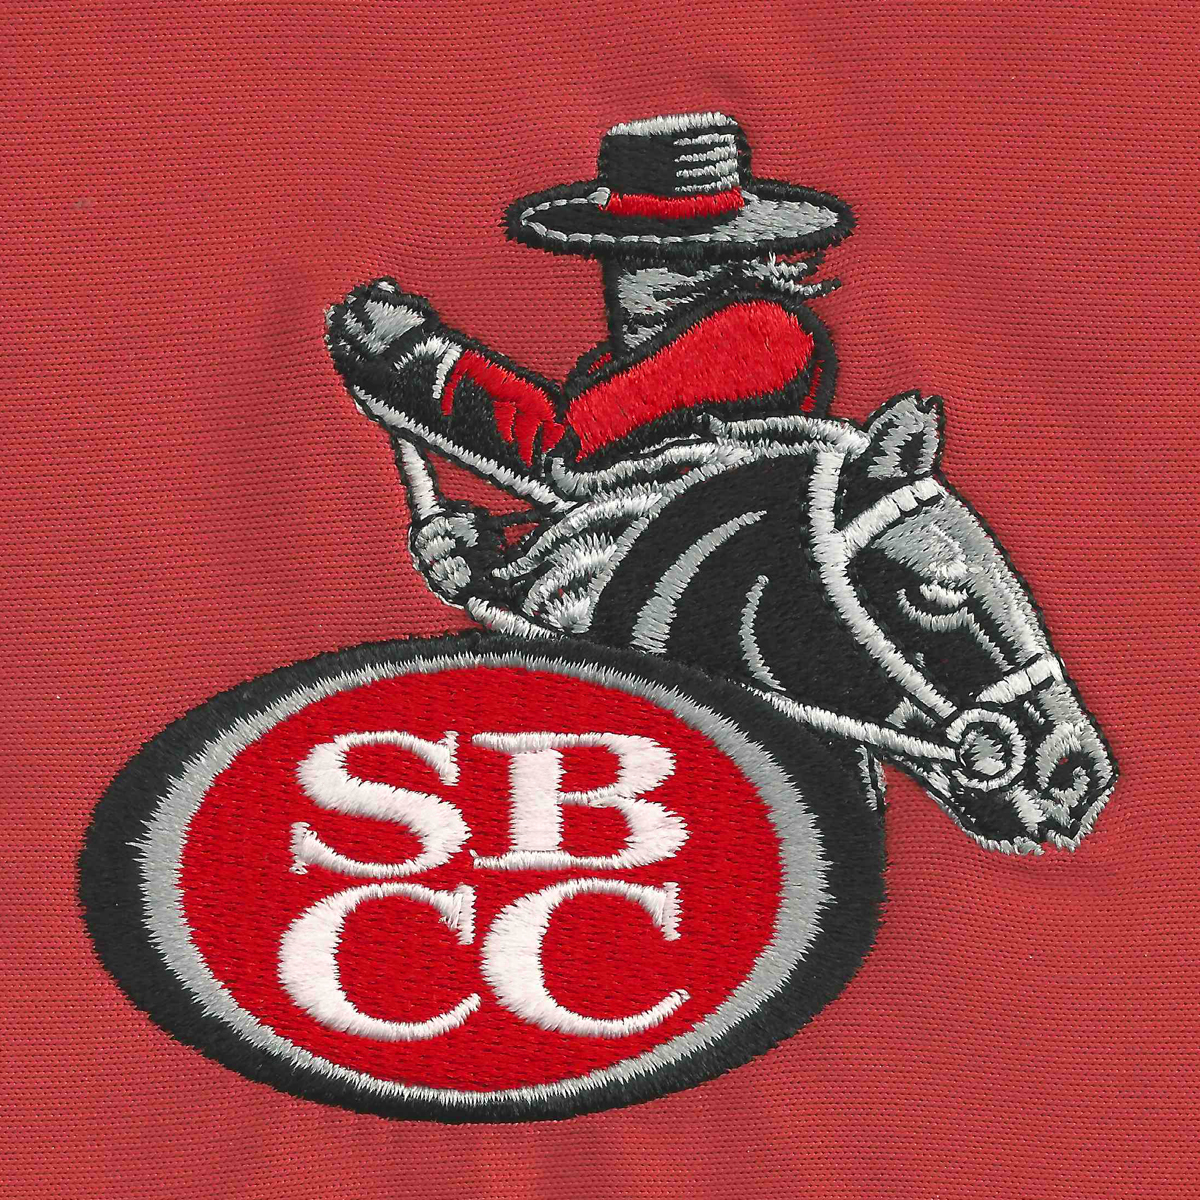 SBCC Vaquero.jpg